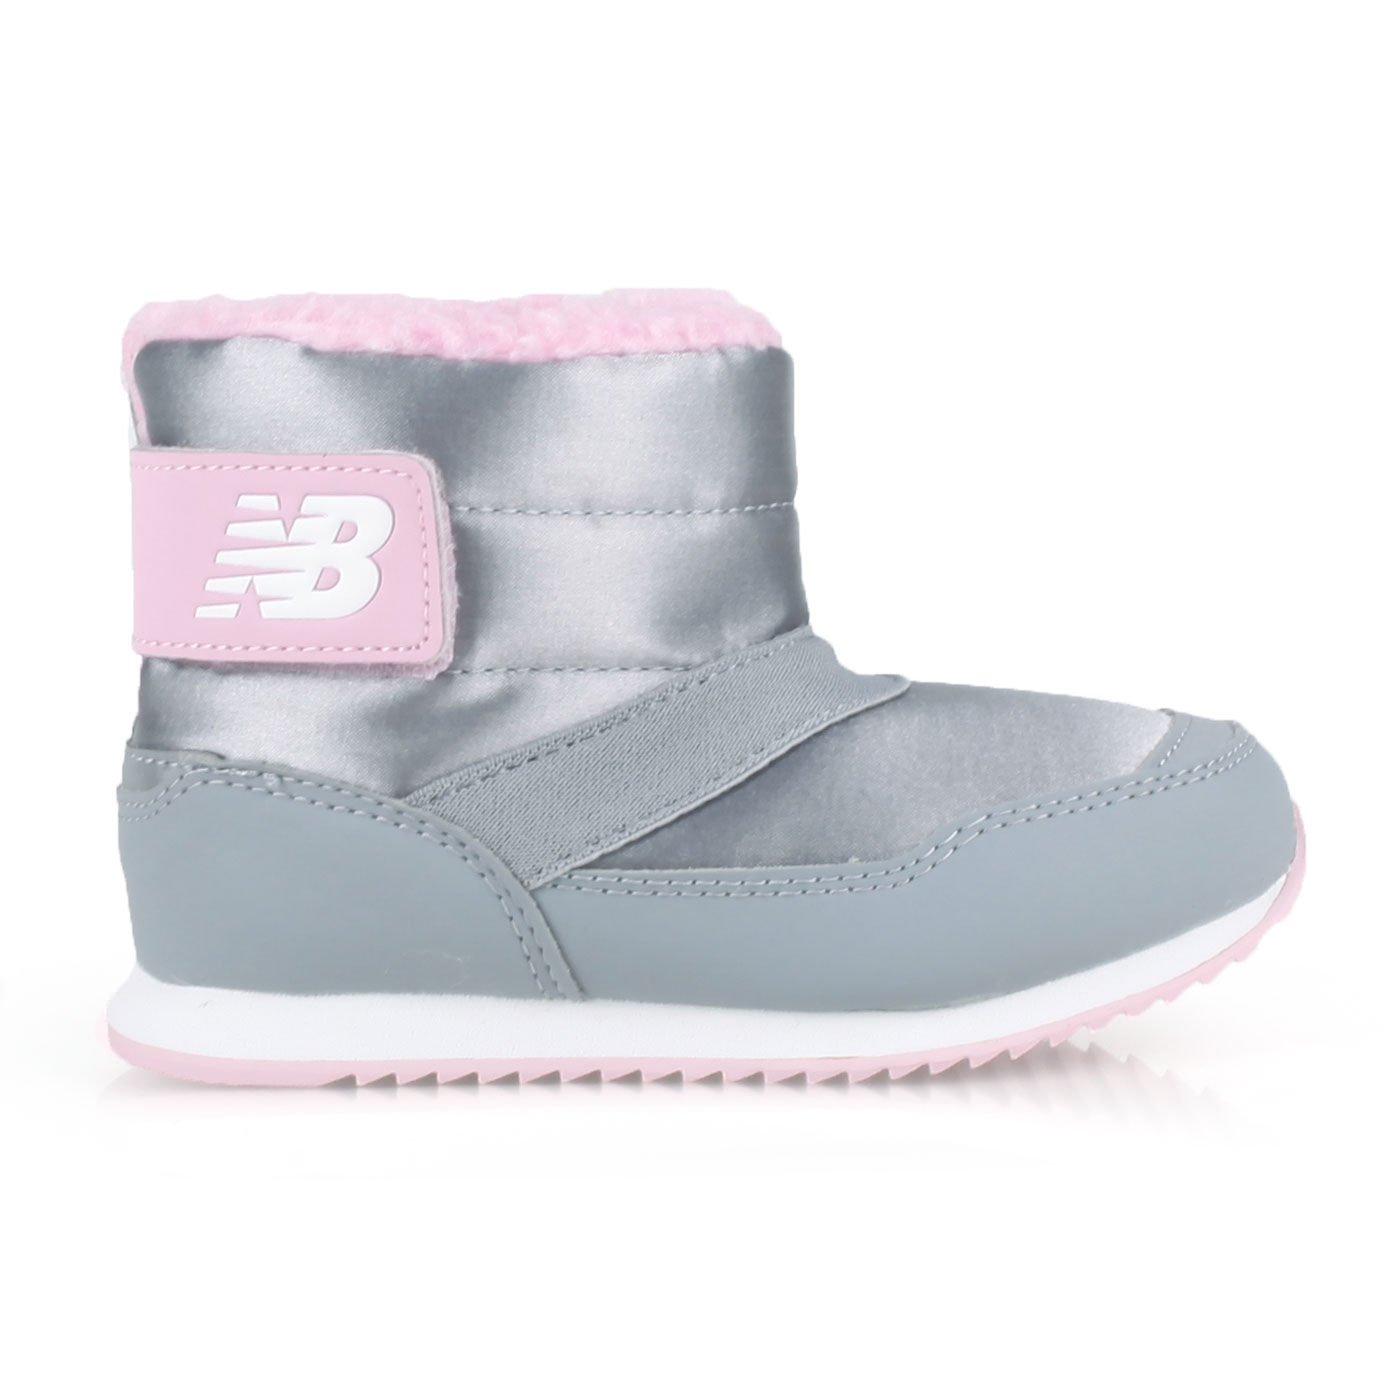 NEW BALANCE 小童保暖短筒靴-WIDE IO996BTY - 灰粉紅白